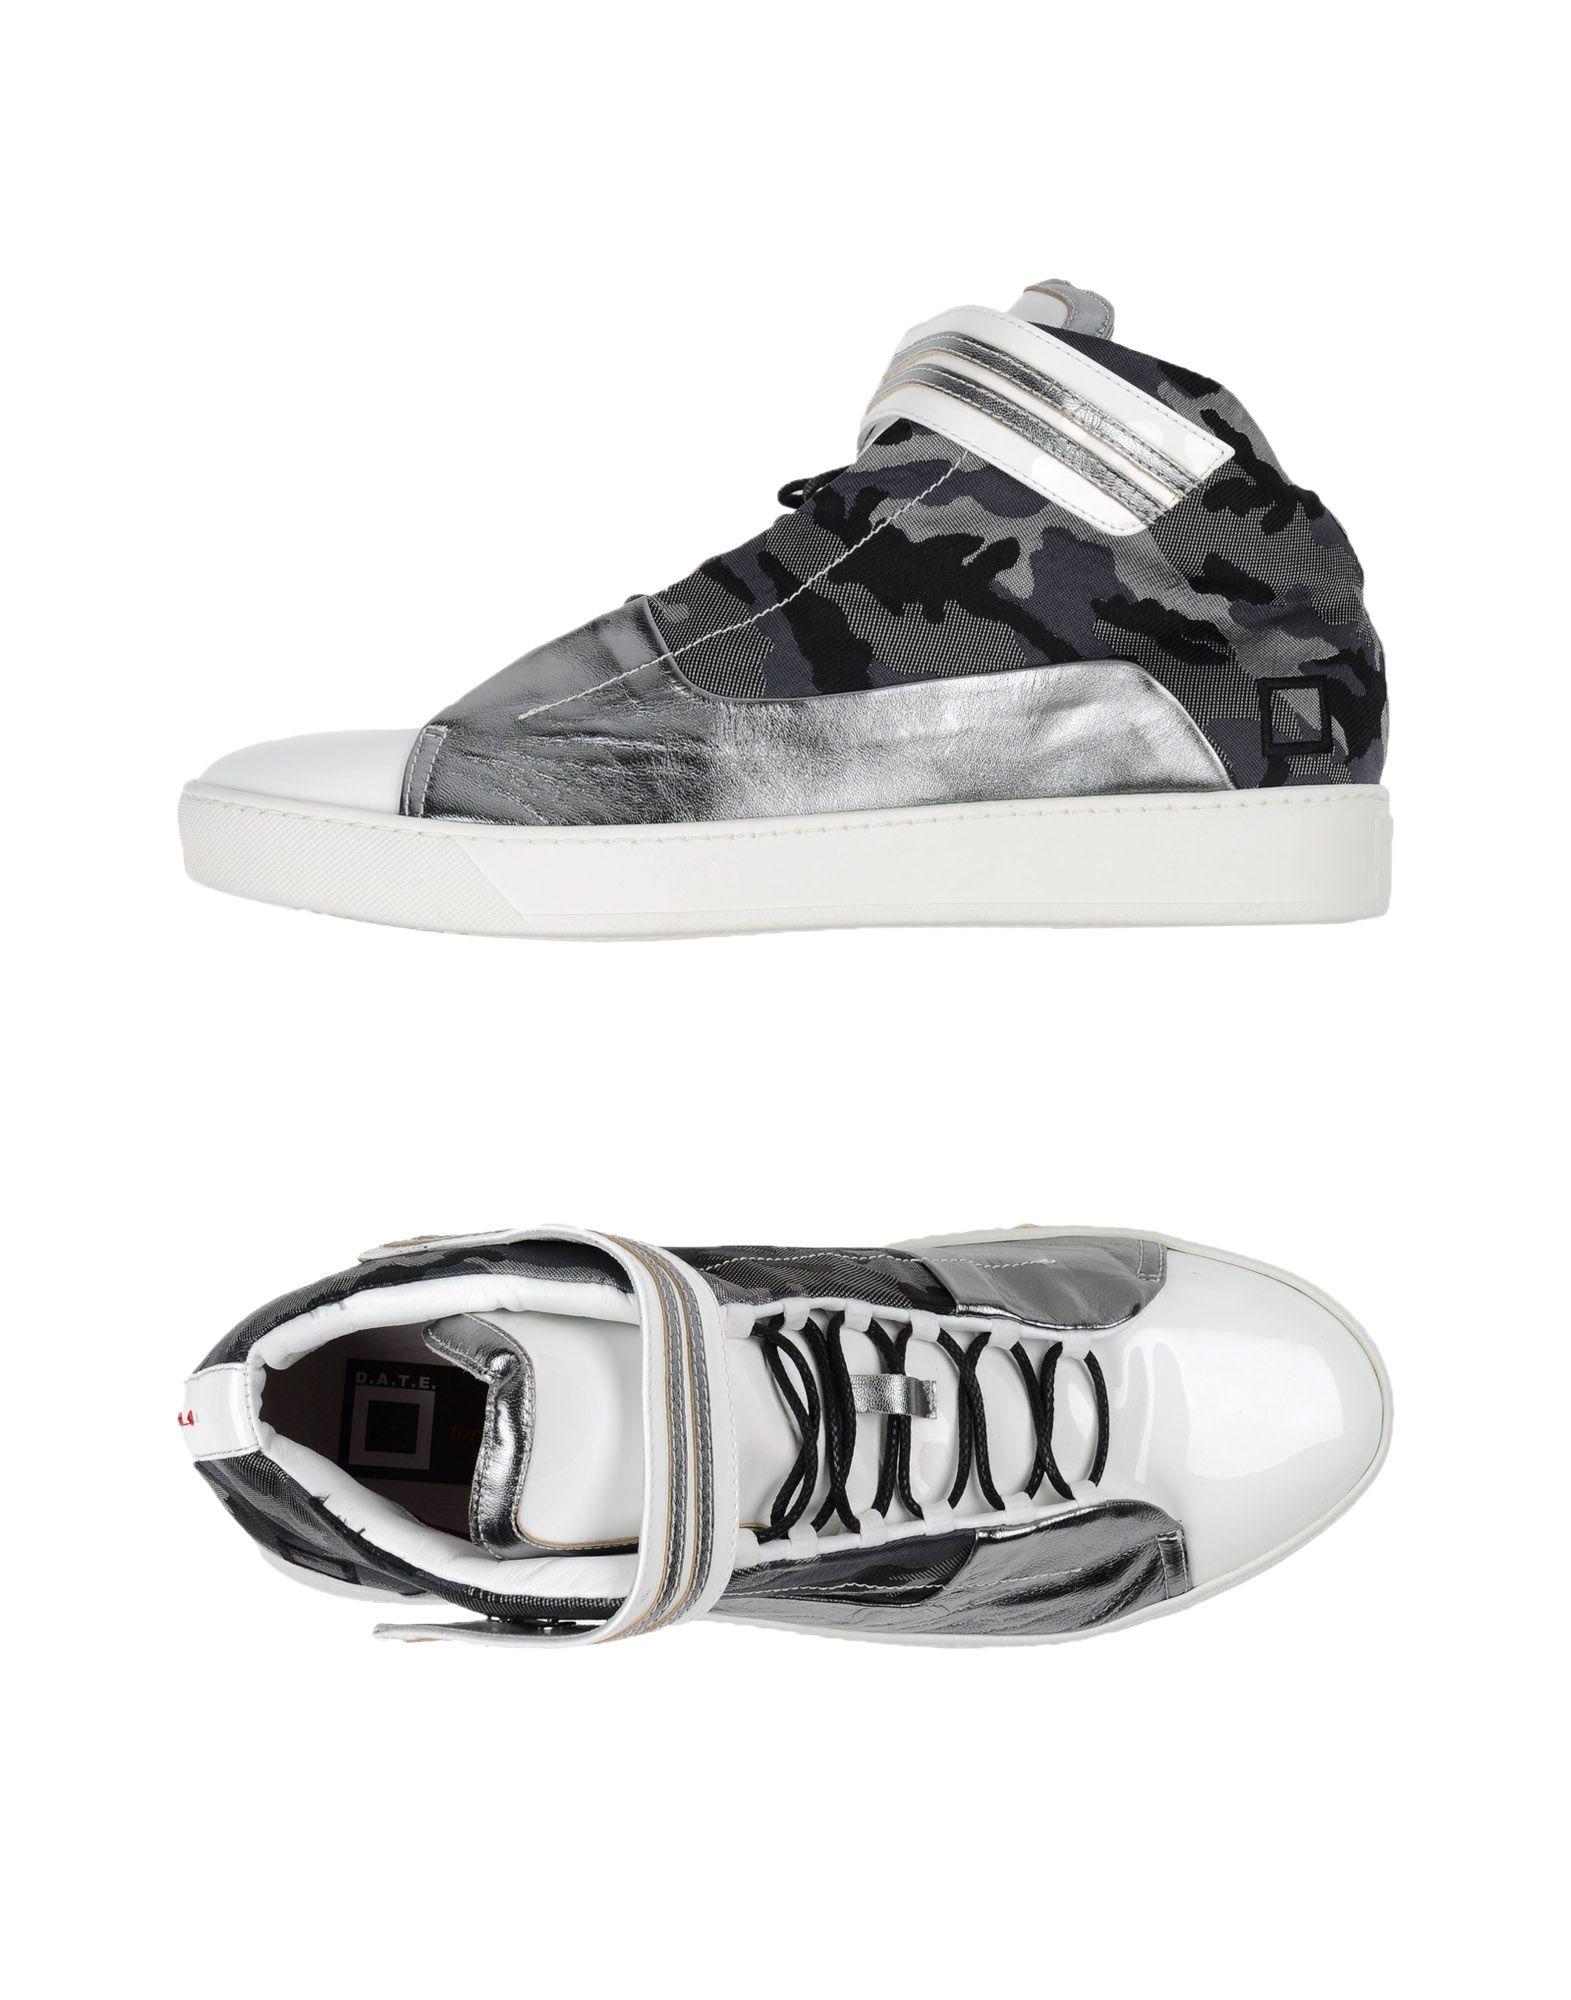 D.A.T.E. X Giuliano Fujiwara Fujiwara Fujiwara Sneakers - Men D.A.T.E. X Giuliano Fujiwara Sneakers online on  Australia - 44984905VX f4005e